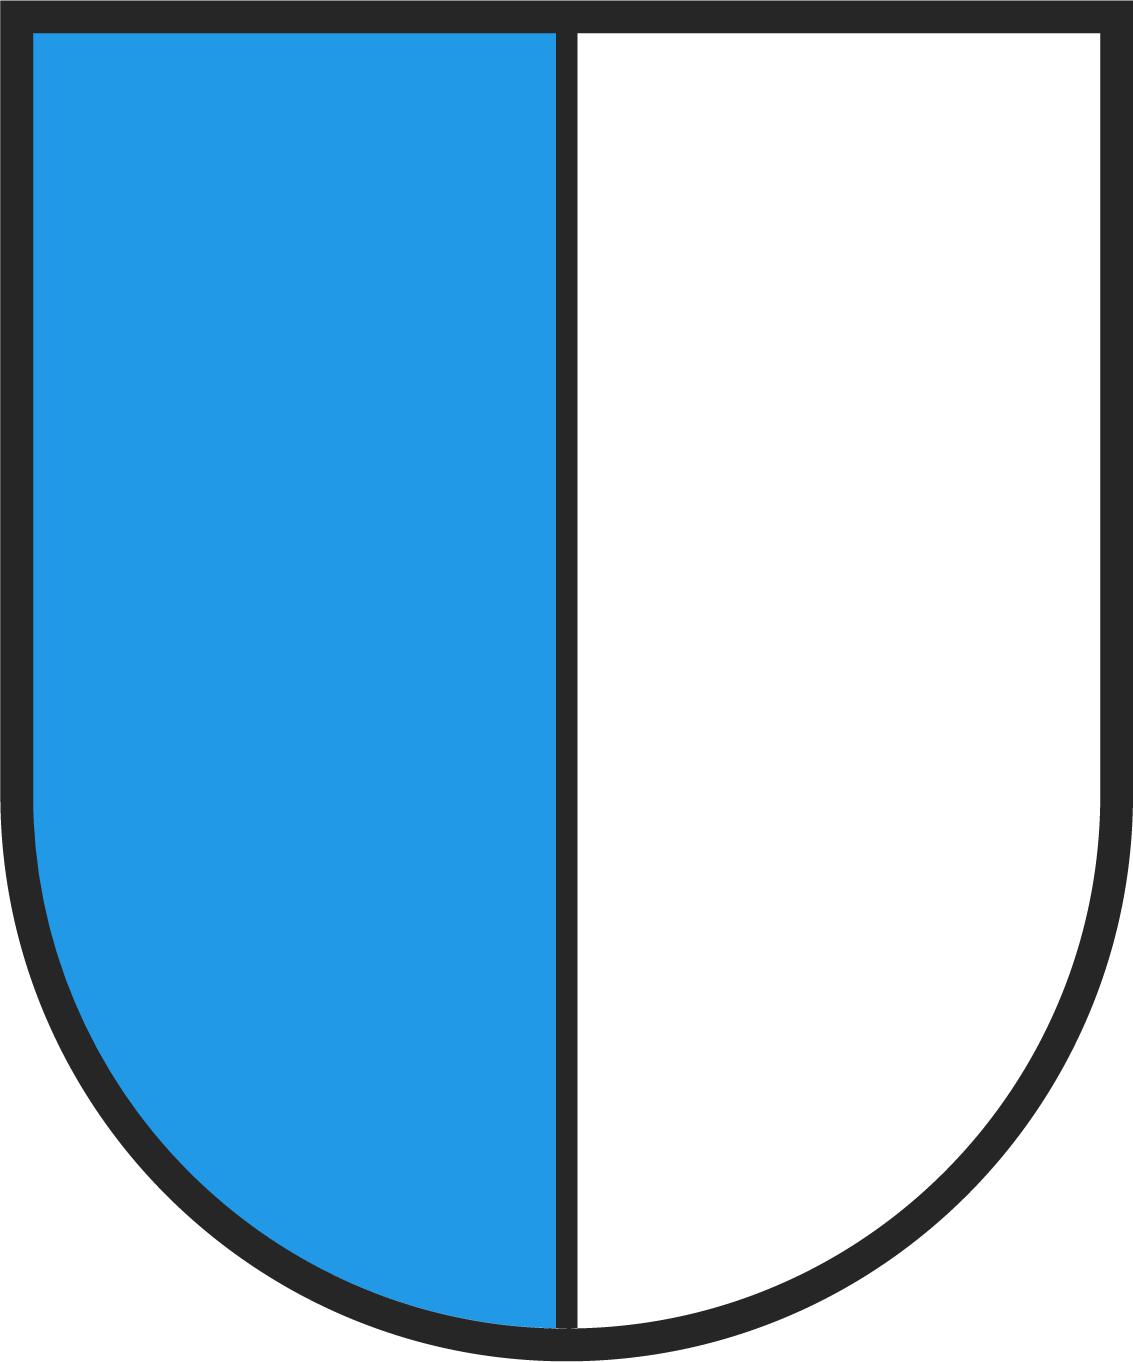 Wappen des Kantons Luzern